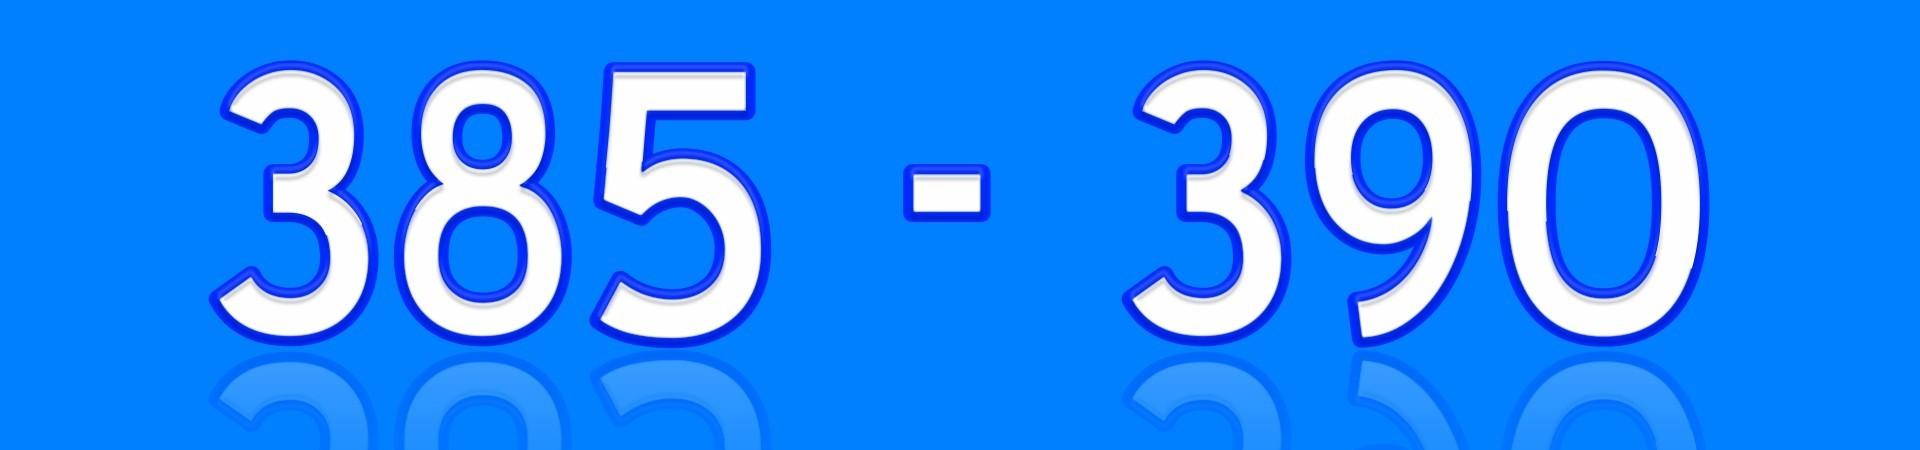 385 390